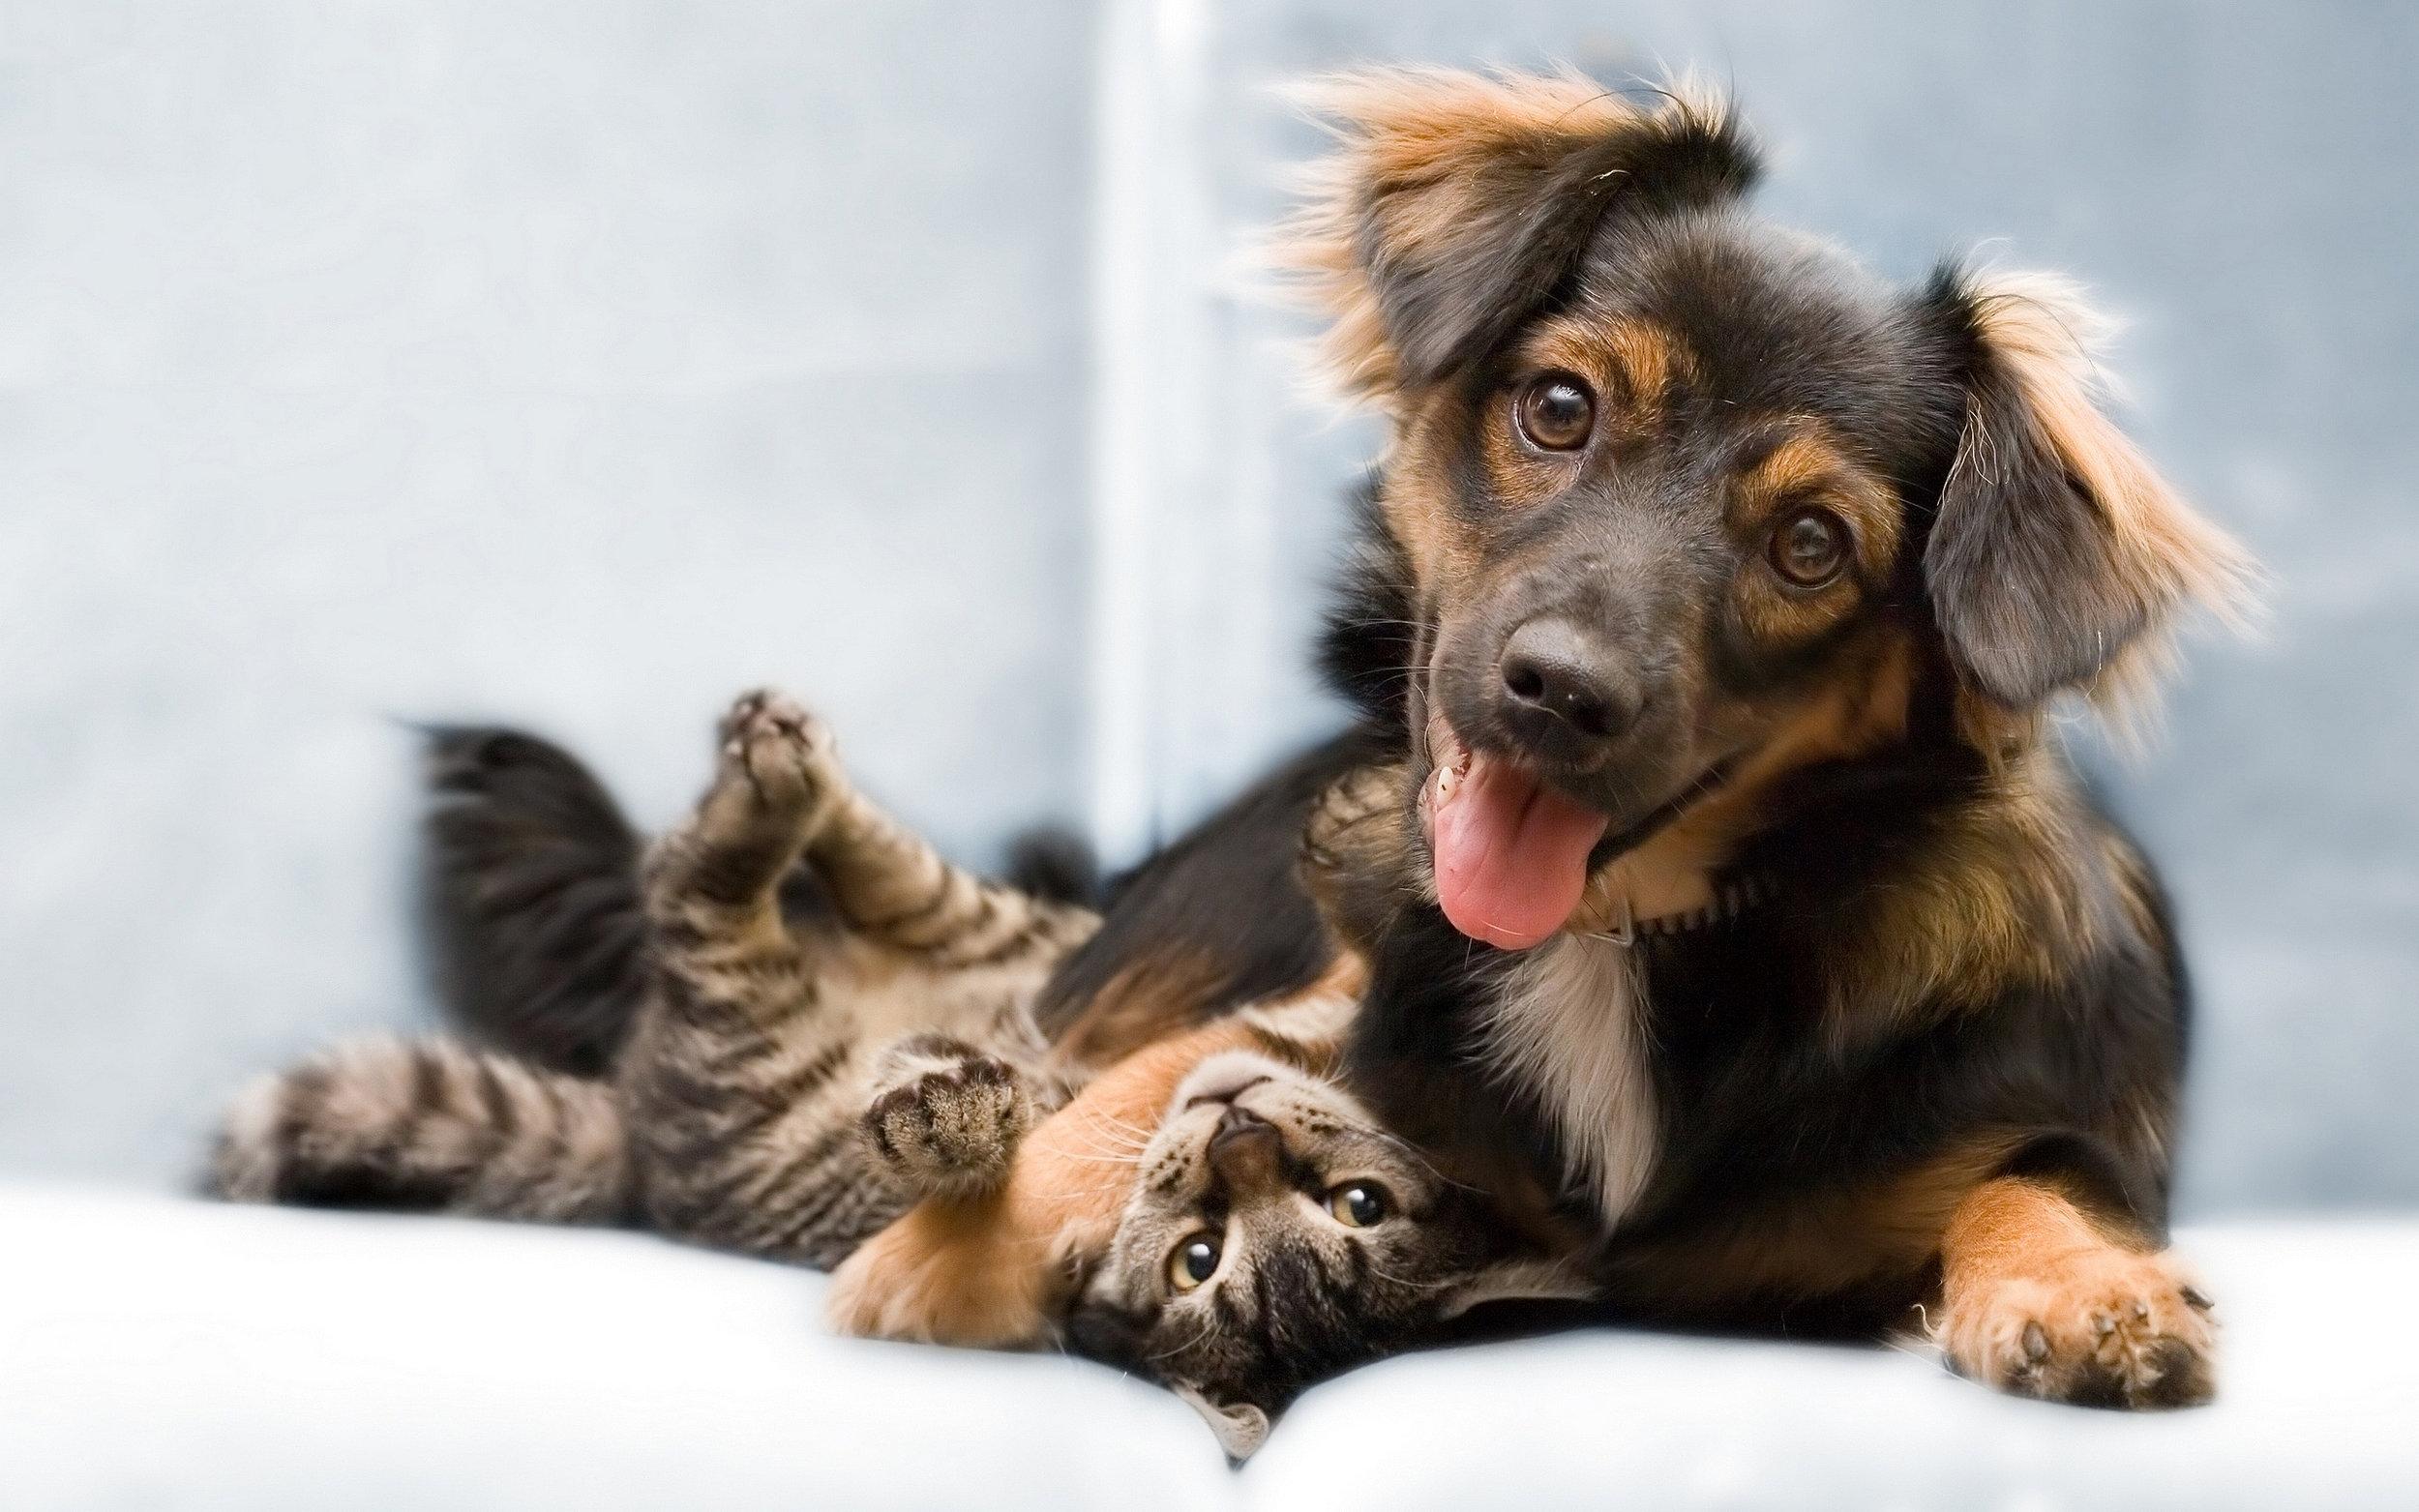 6986681-dog-cat-friends.jpg